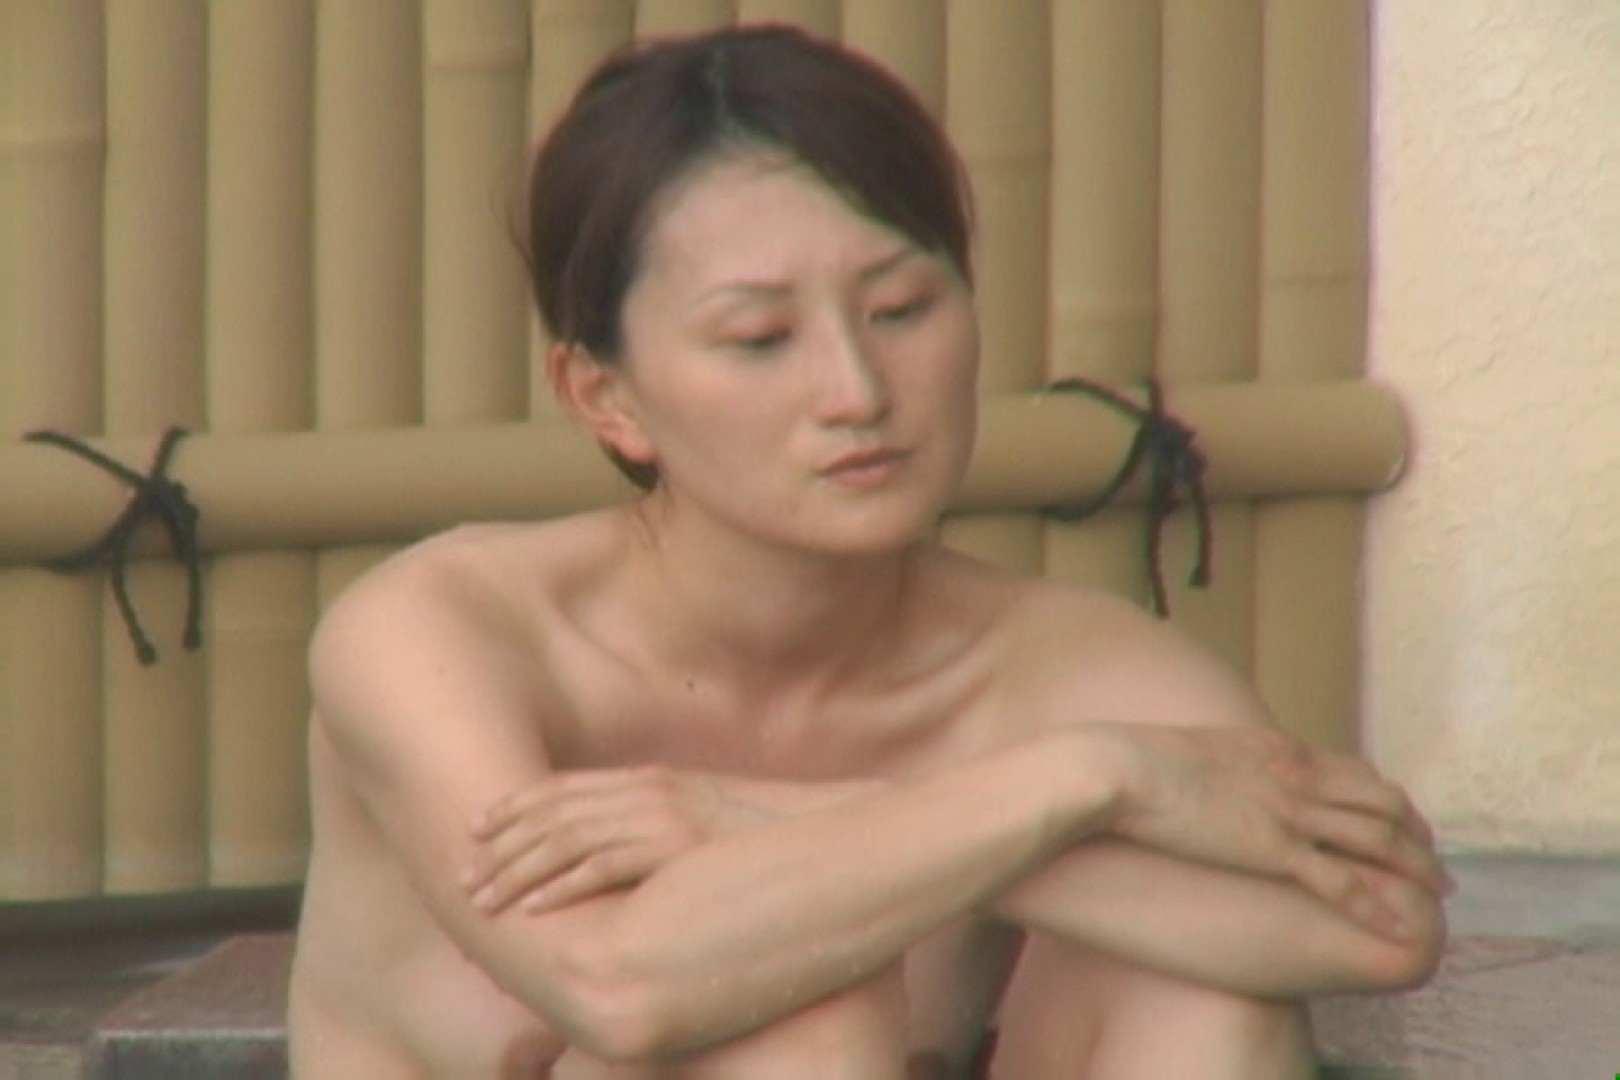 Aquaな露天風呂Vol.578 盗撮特撮 ヌード画像 10pic 5